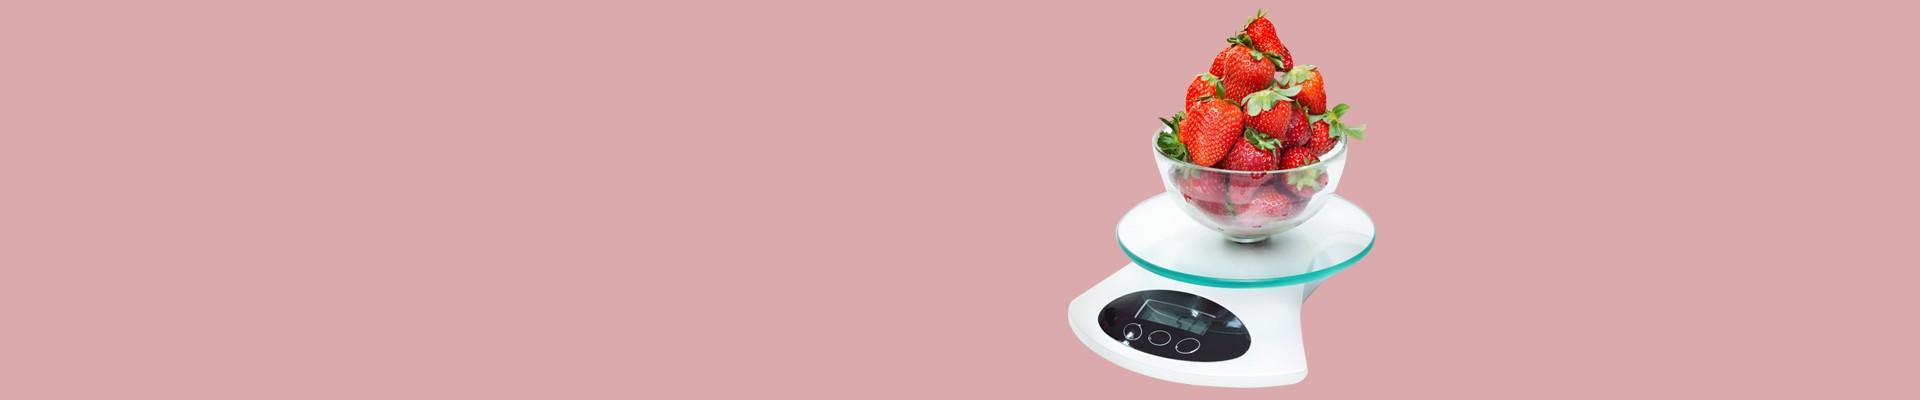 Timbangan Dapur Untuk Kue Terbaik - Harga Timbangan Dapur Murah